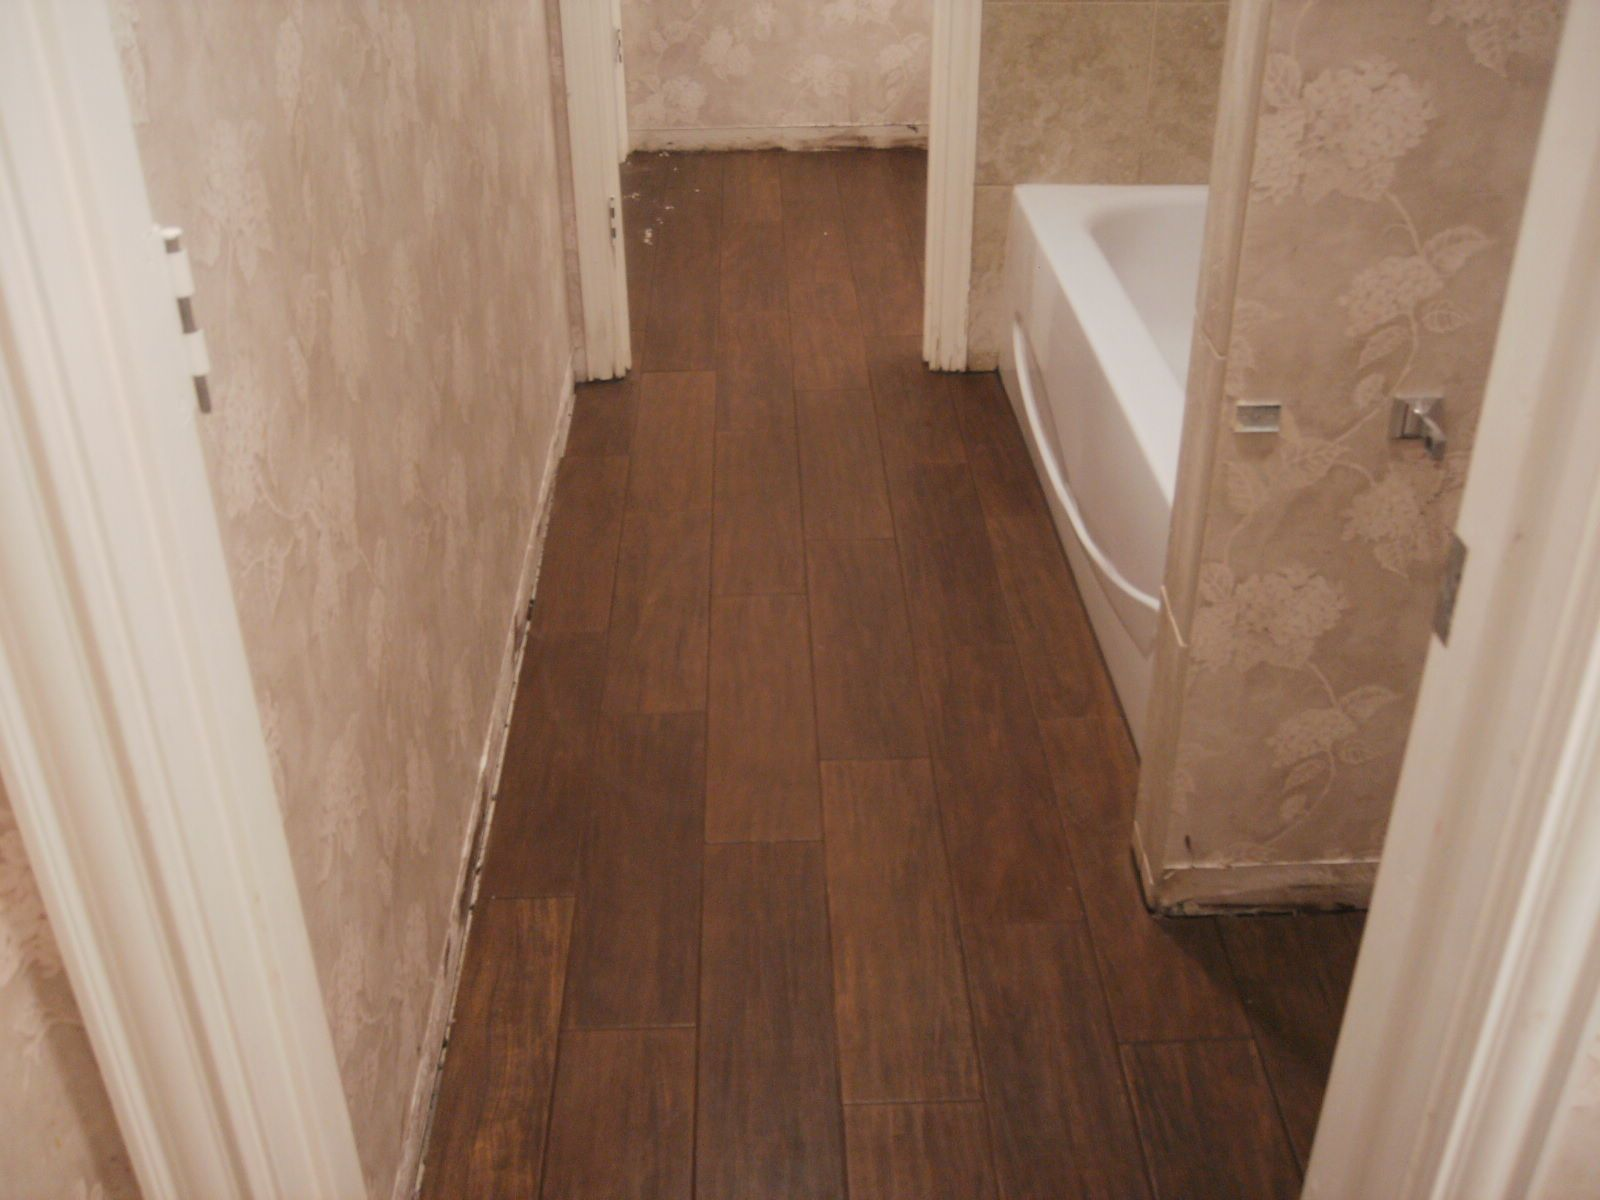 Dazzling Porcelain Tile That Looks Like Wood Design For Creative - Faux wood tile bathroom for bathroom decor ideas